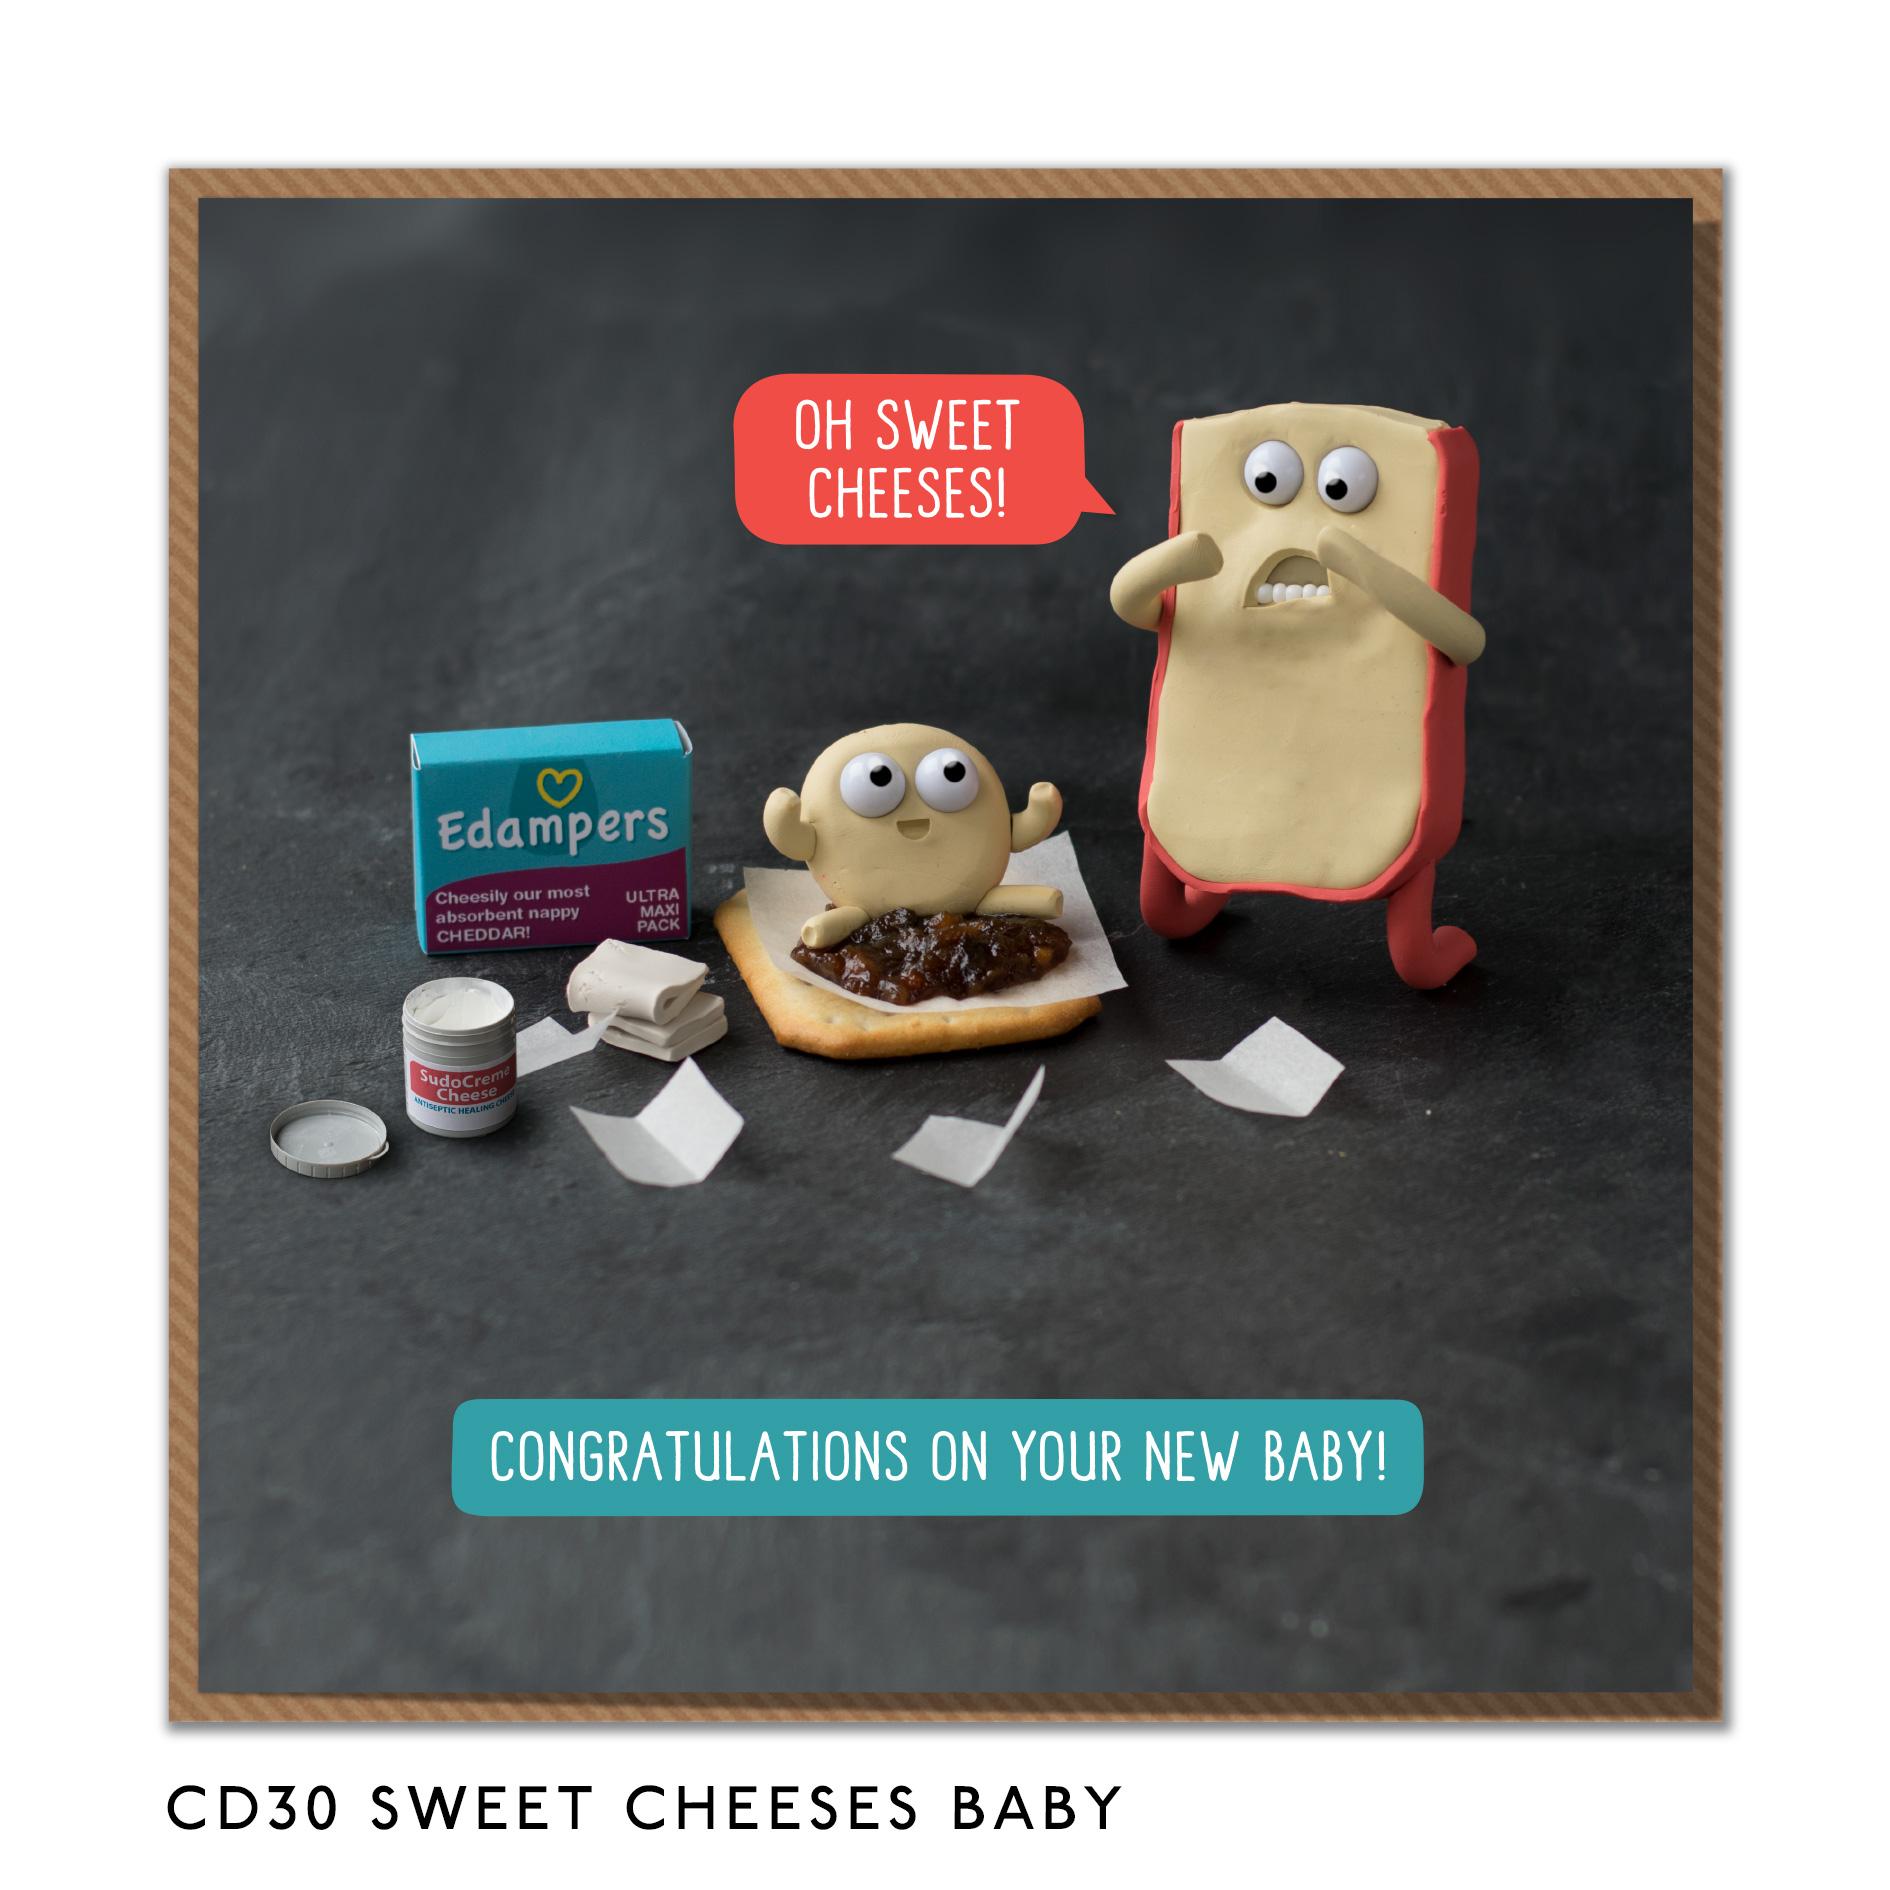 CD30-SWEET-CHEESES-BABY.jpg